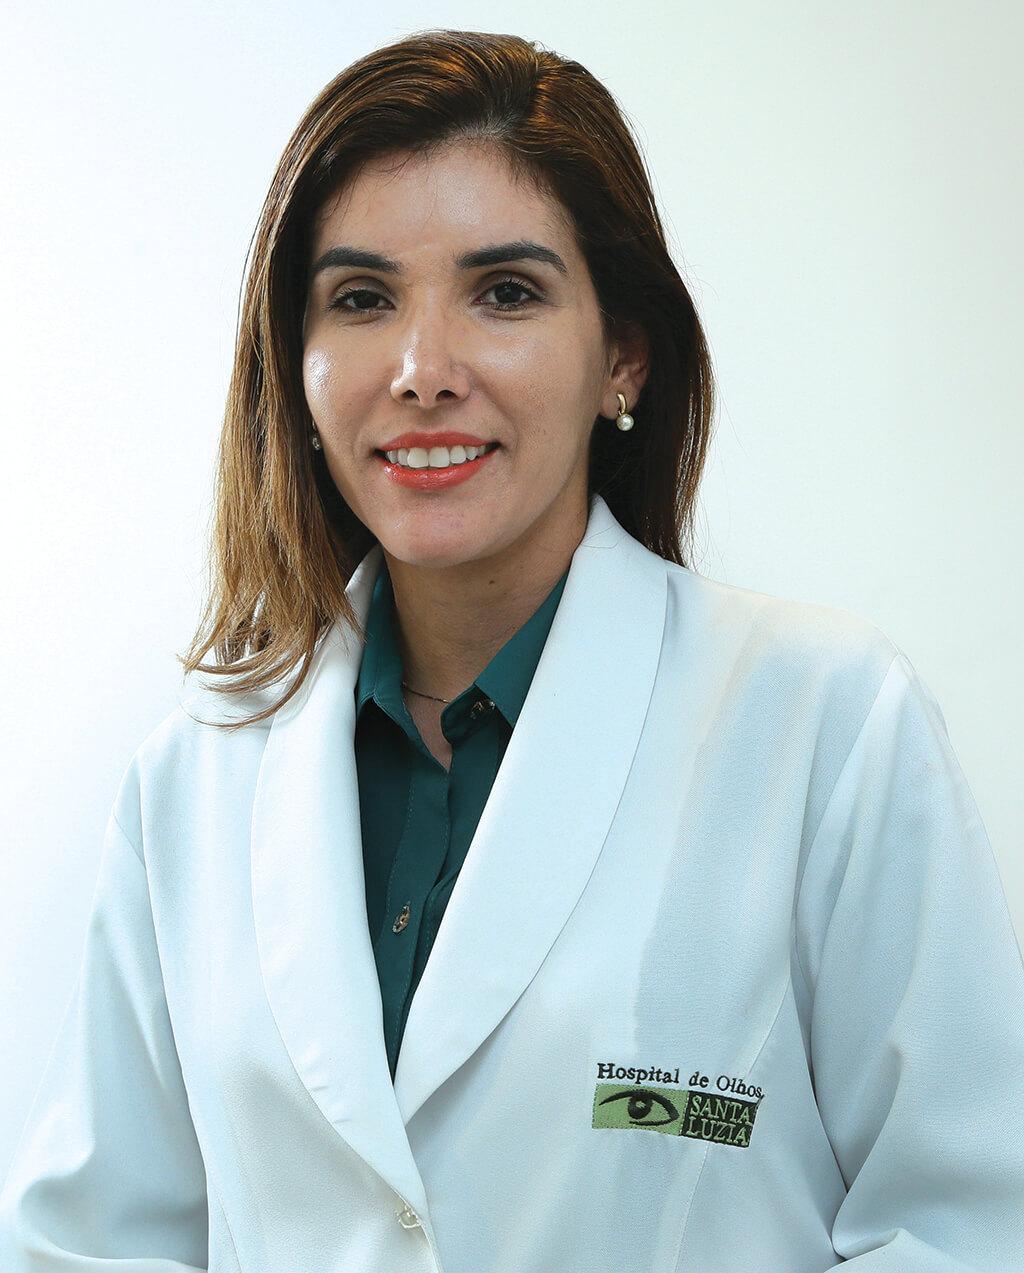 Jayse Galvão